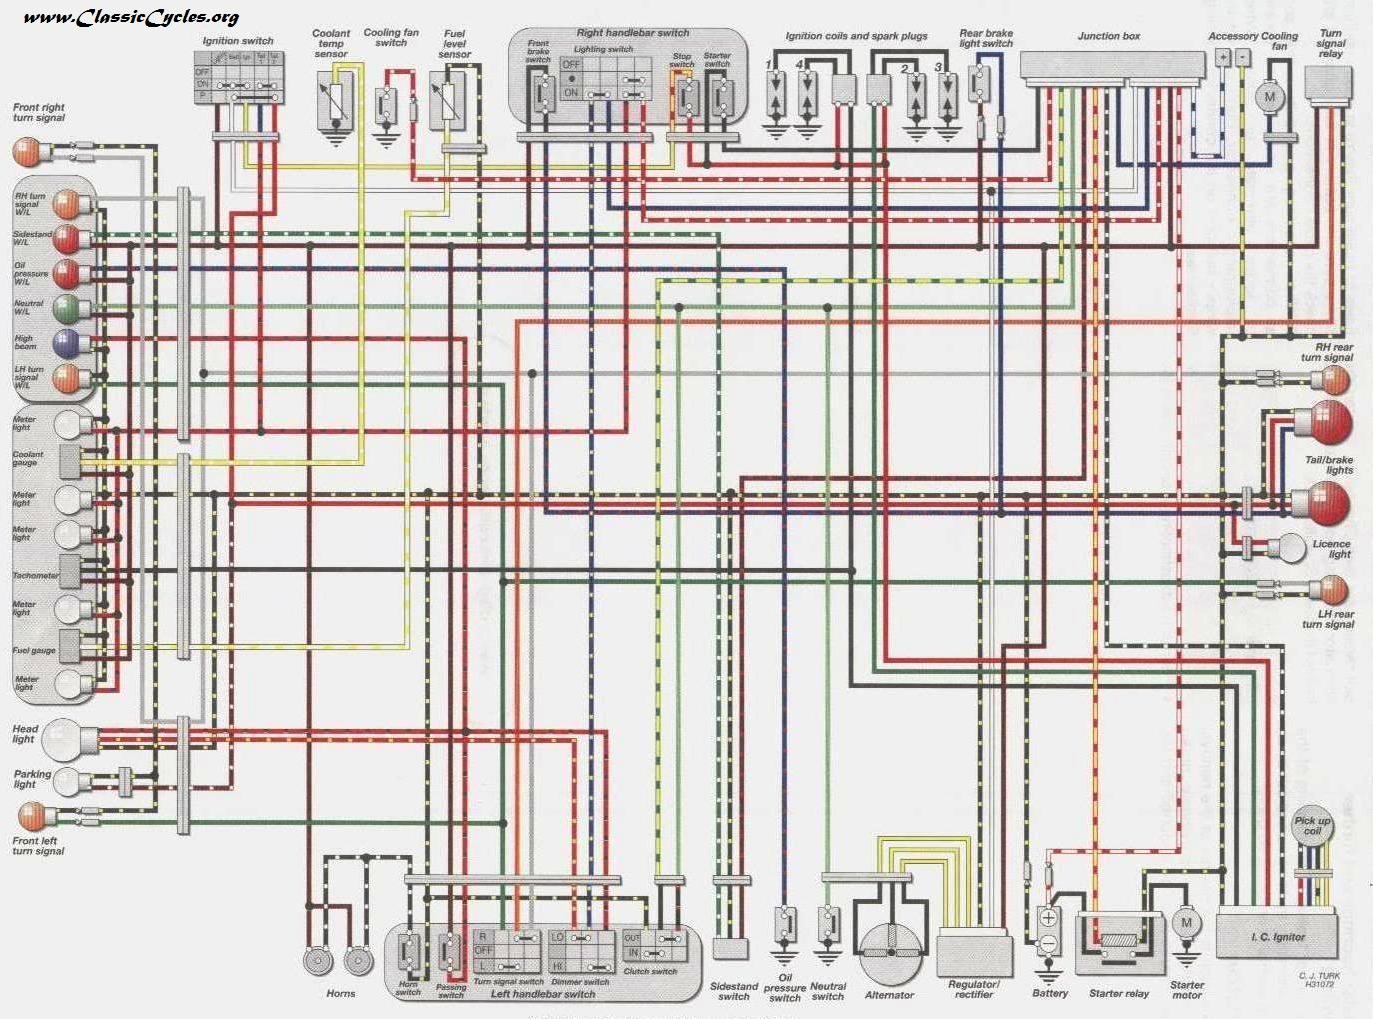 Honda Shadow Vt1100 Wiring Diagram